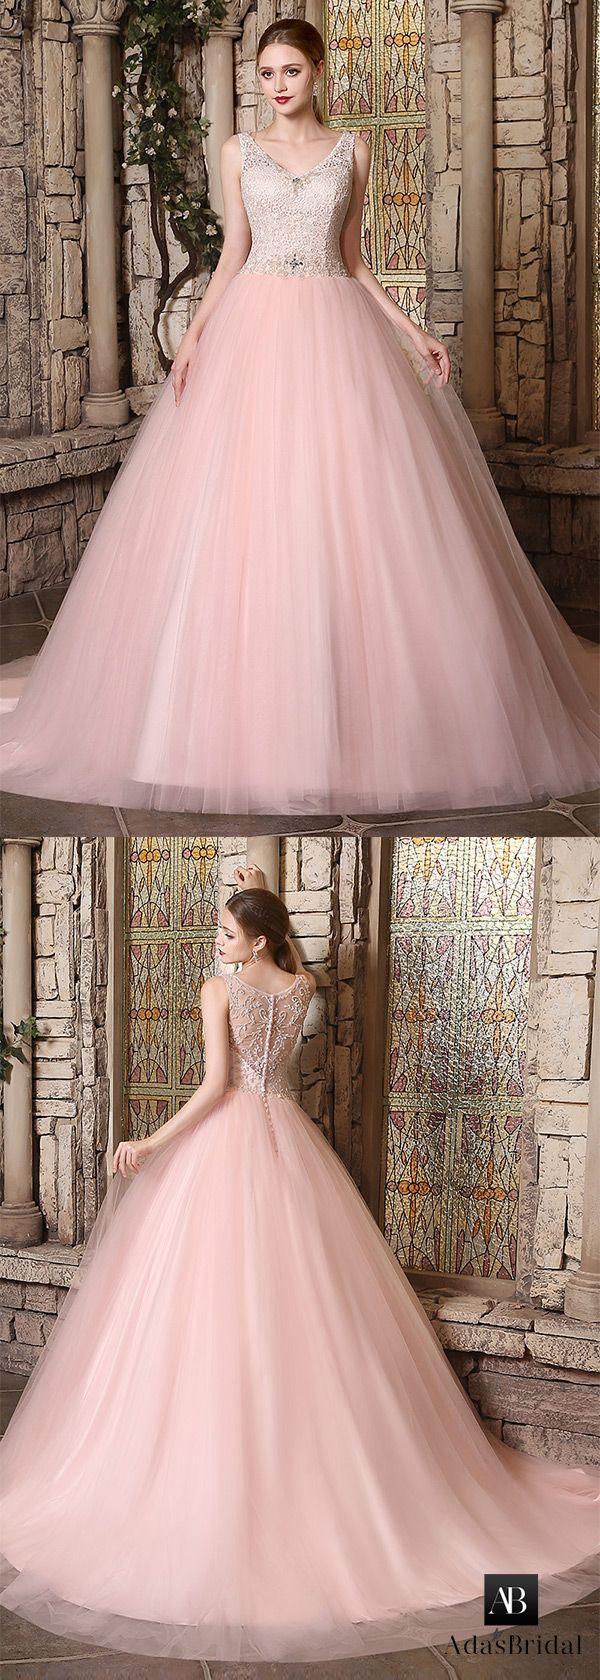 Best 25+ Pink wedding gowns ideas only on Pinterest | Blush ...